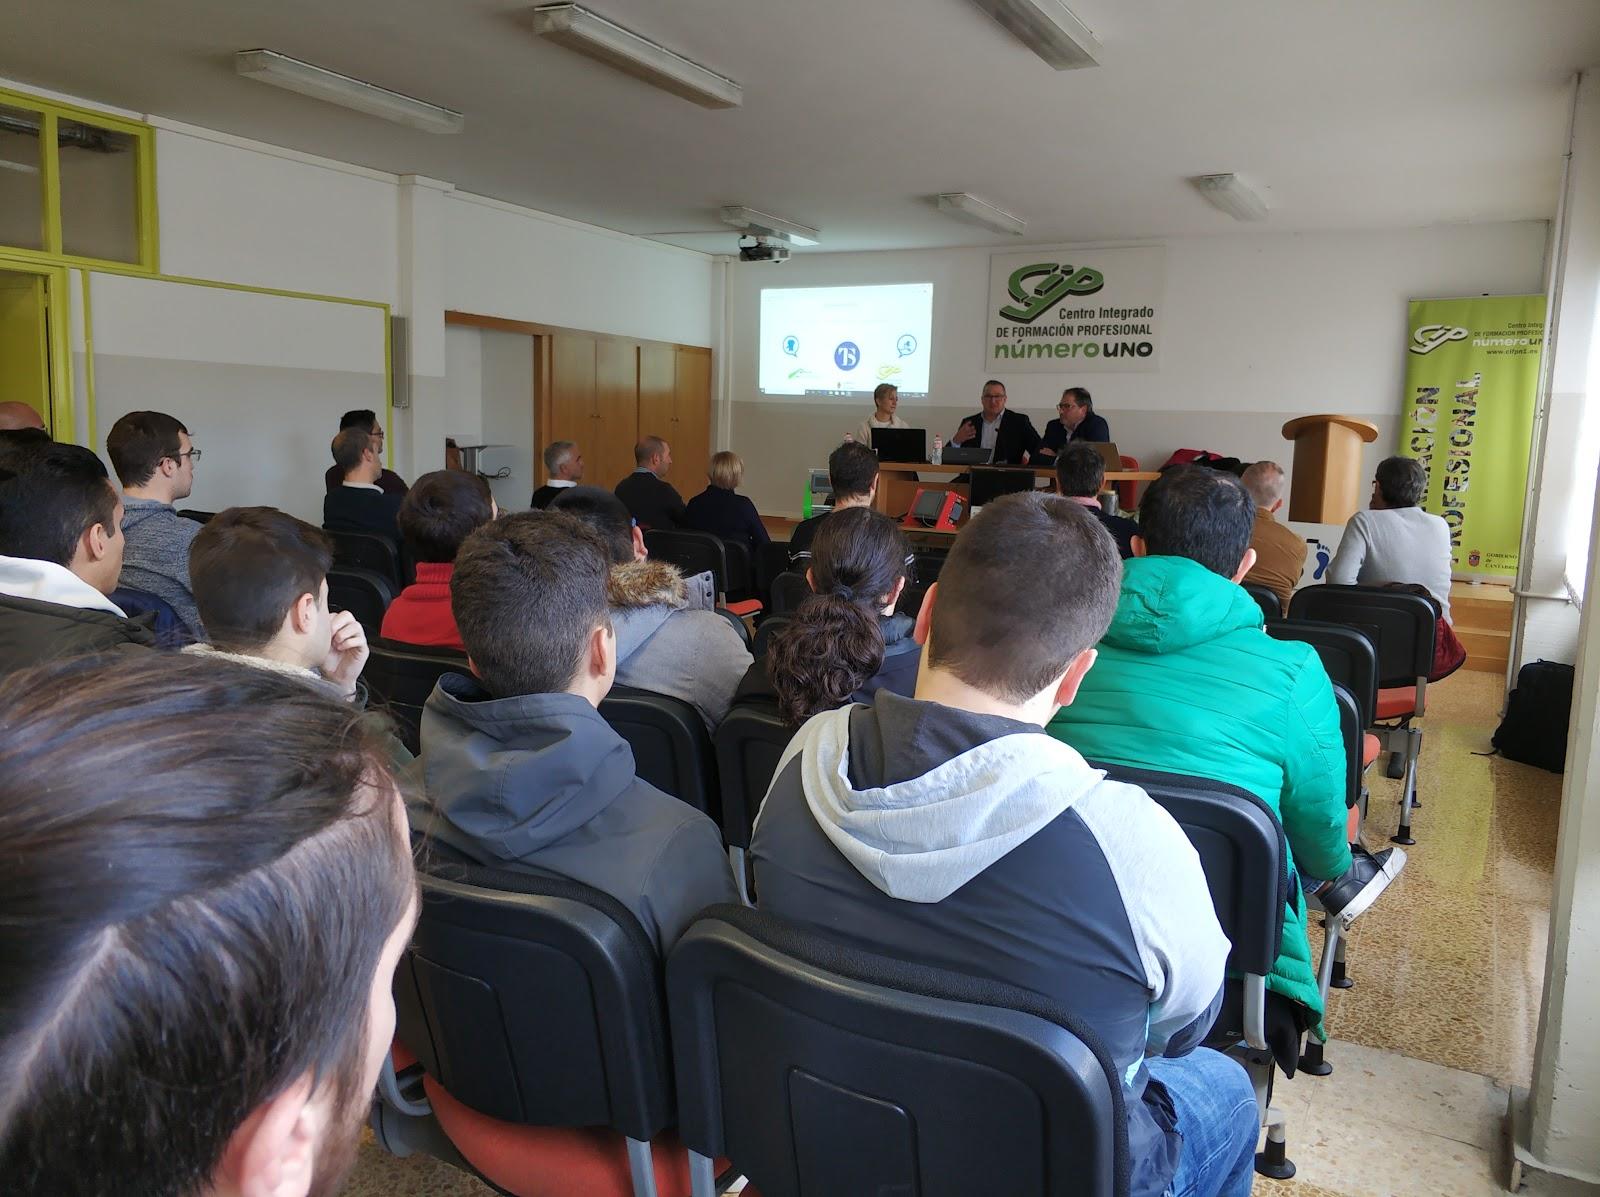 Centro Integrado De Formación Profesional Nº 1 De Santander